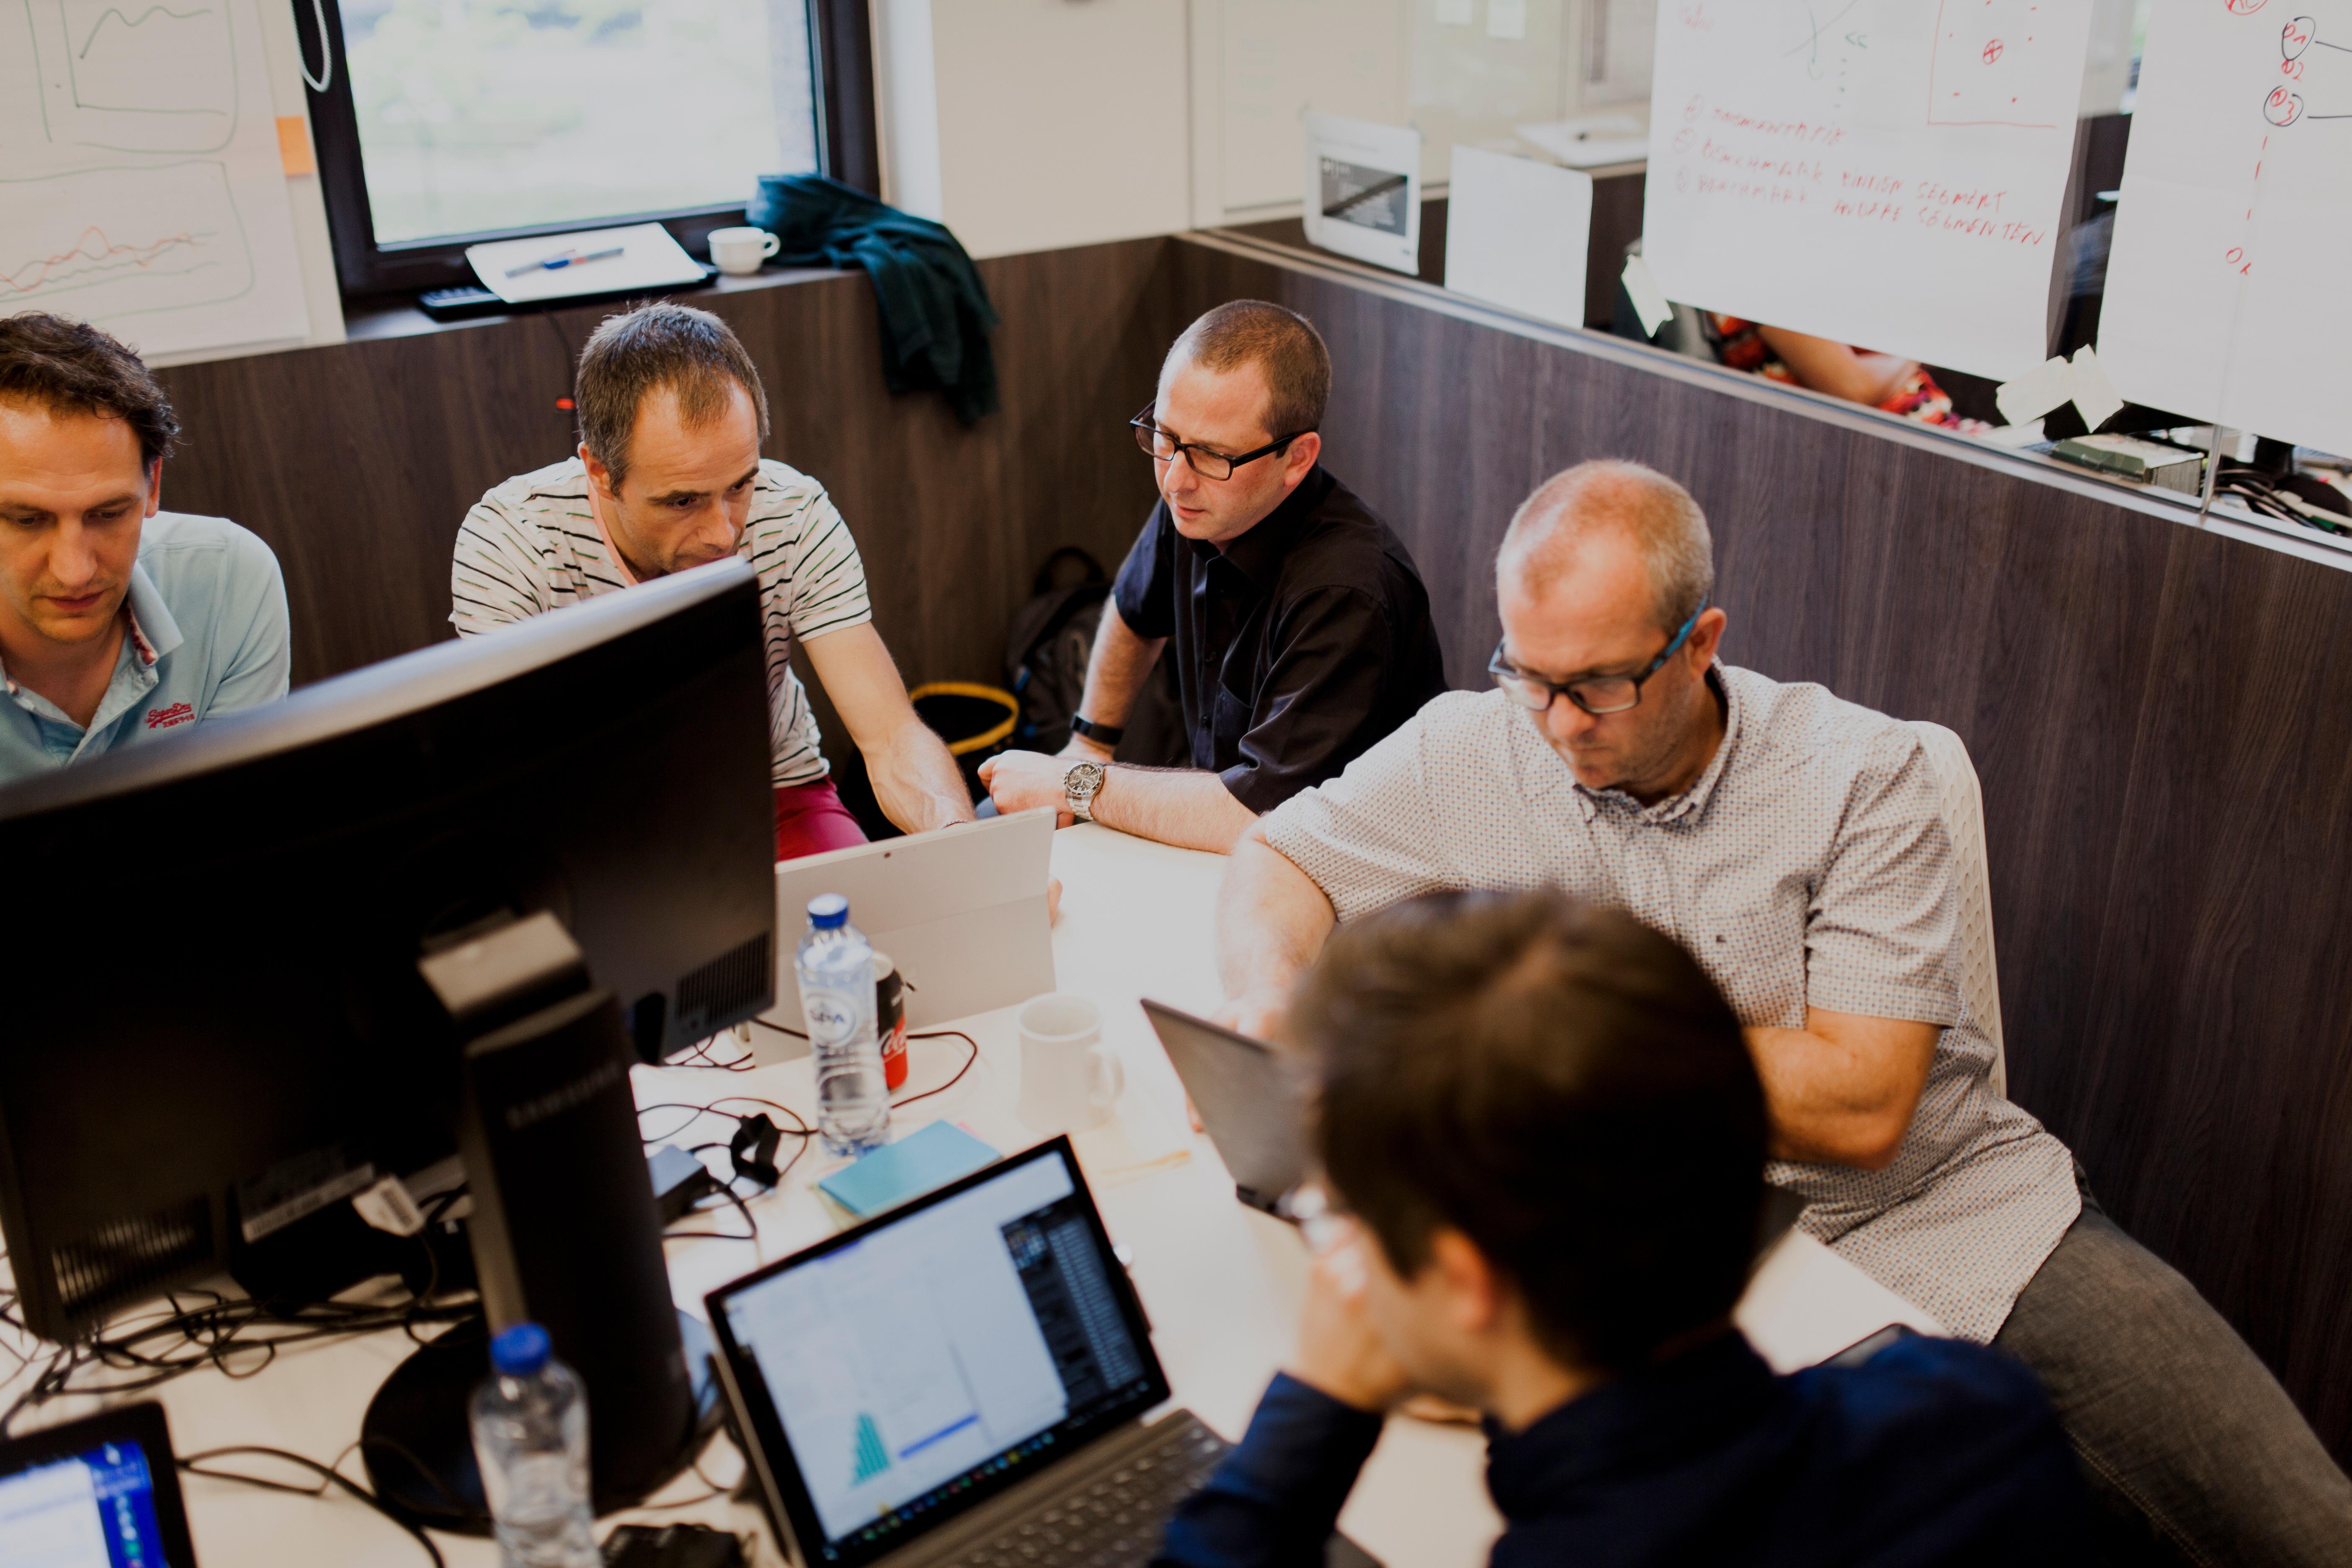 Hackathon 2018: Team Sofico